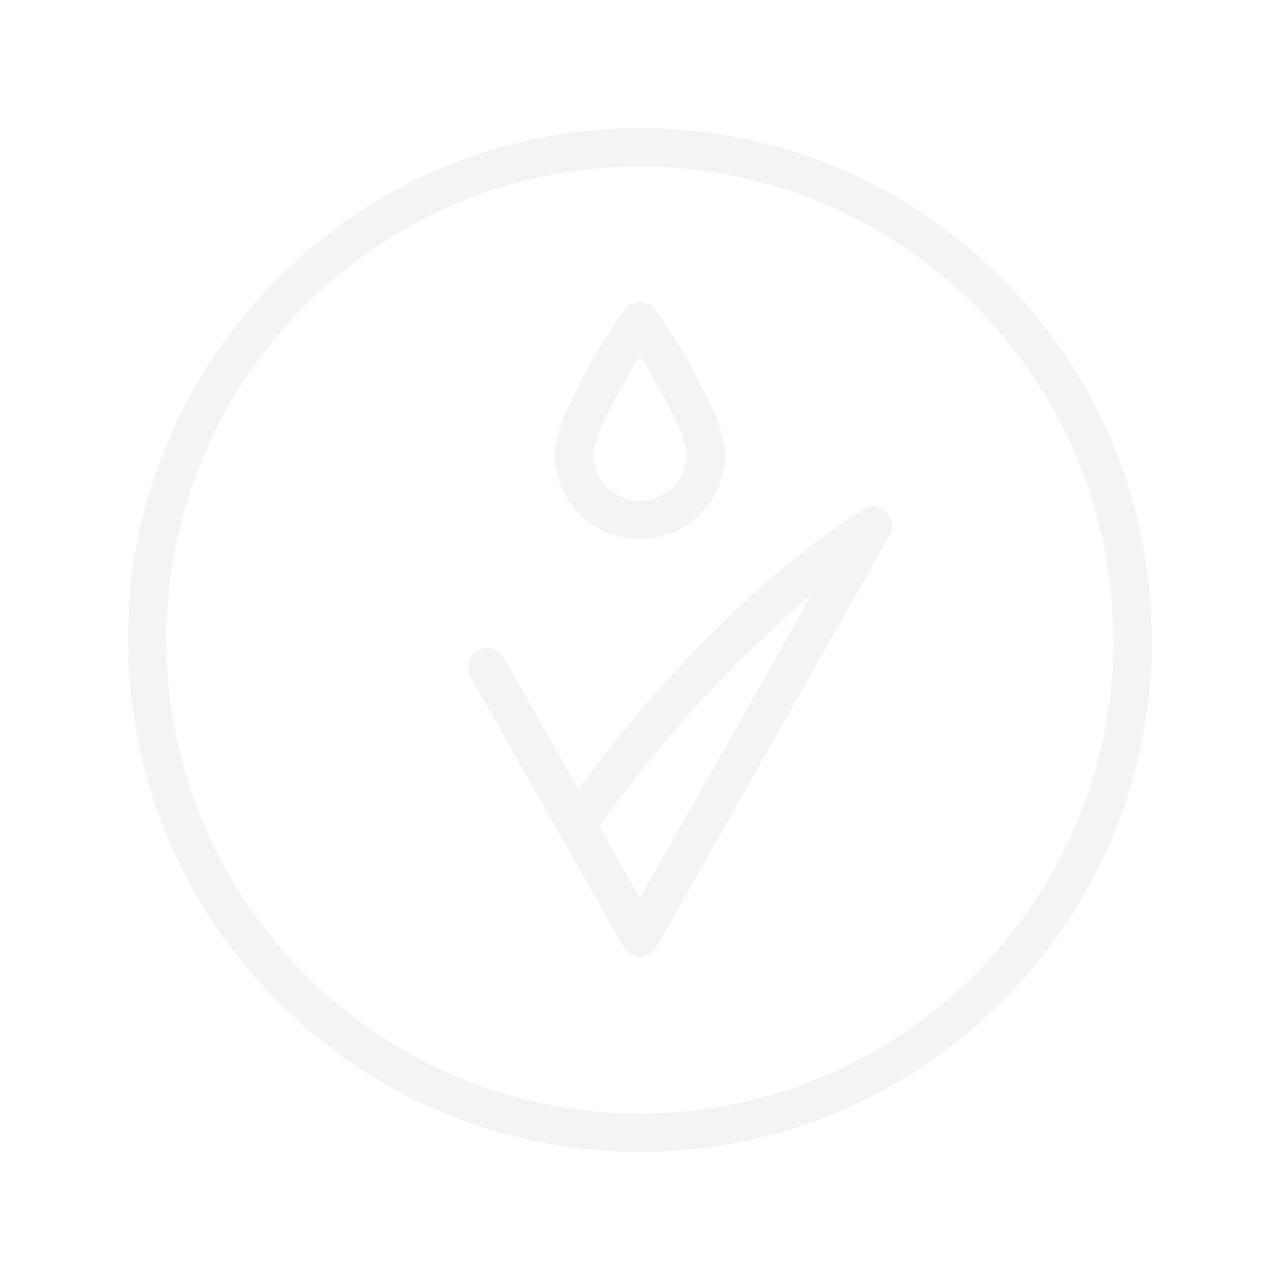 WELLA PROFESSIONALS Elements Shampoo 1000ml